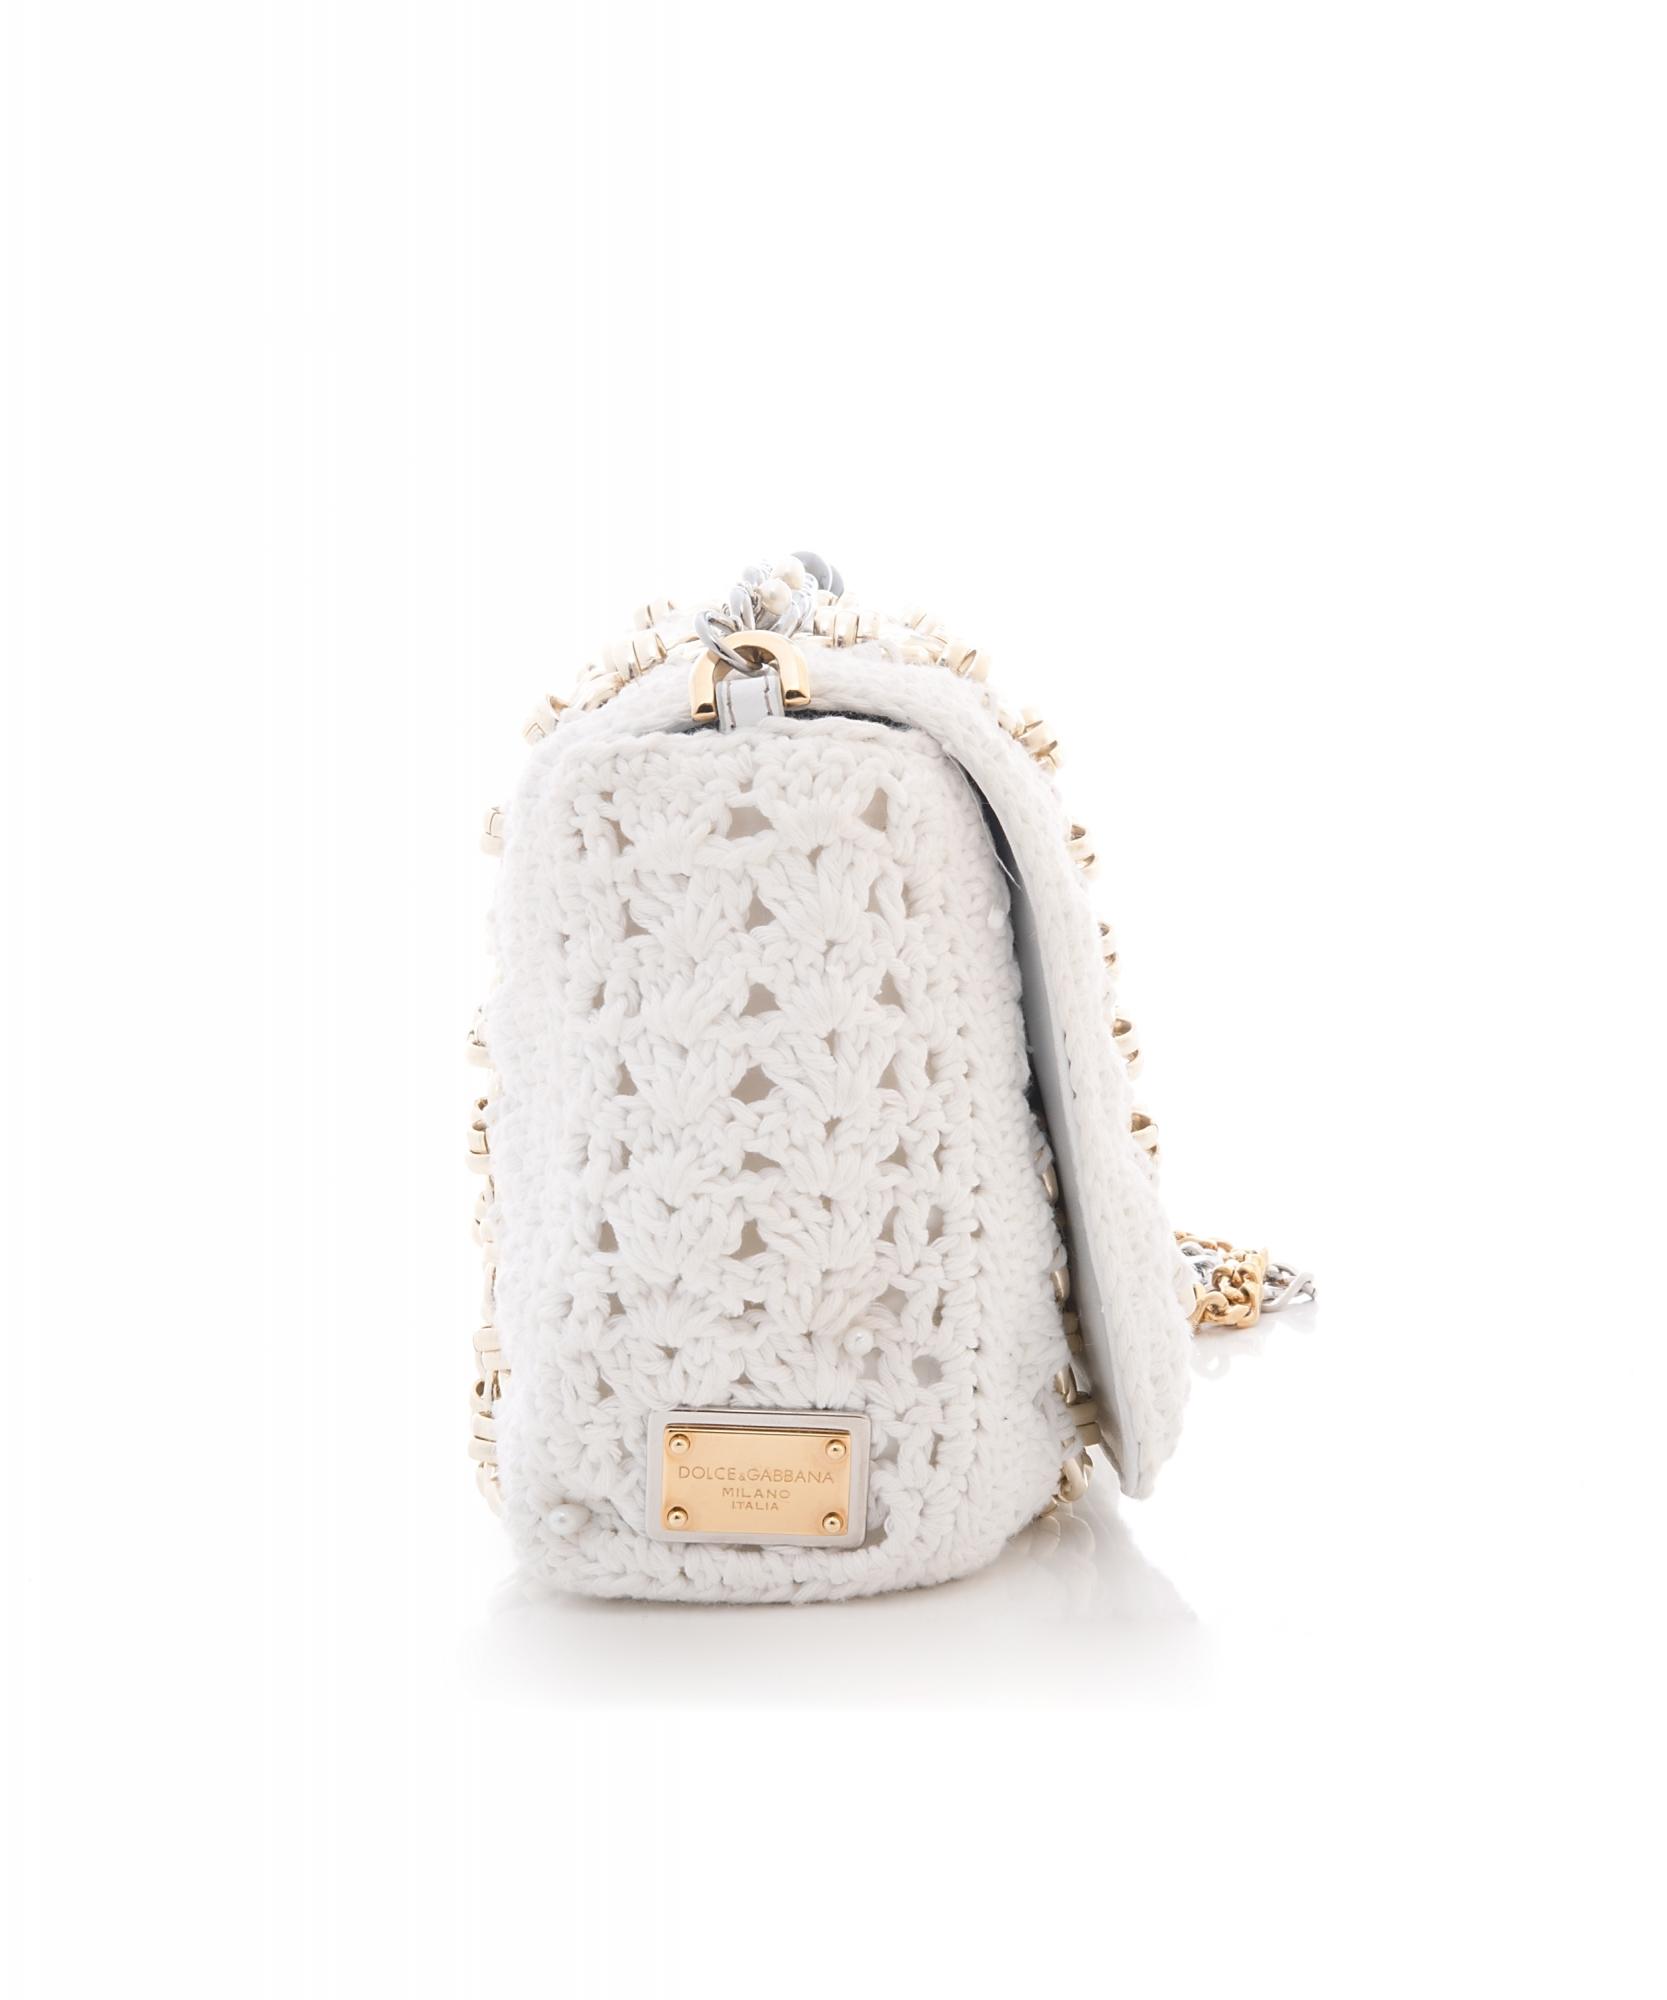 dcf0c263210 ... Shoulder Bags; Dolce & Gabbana Miss Charles Crochet Shoulder Bag. Touch  to zoom